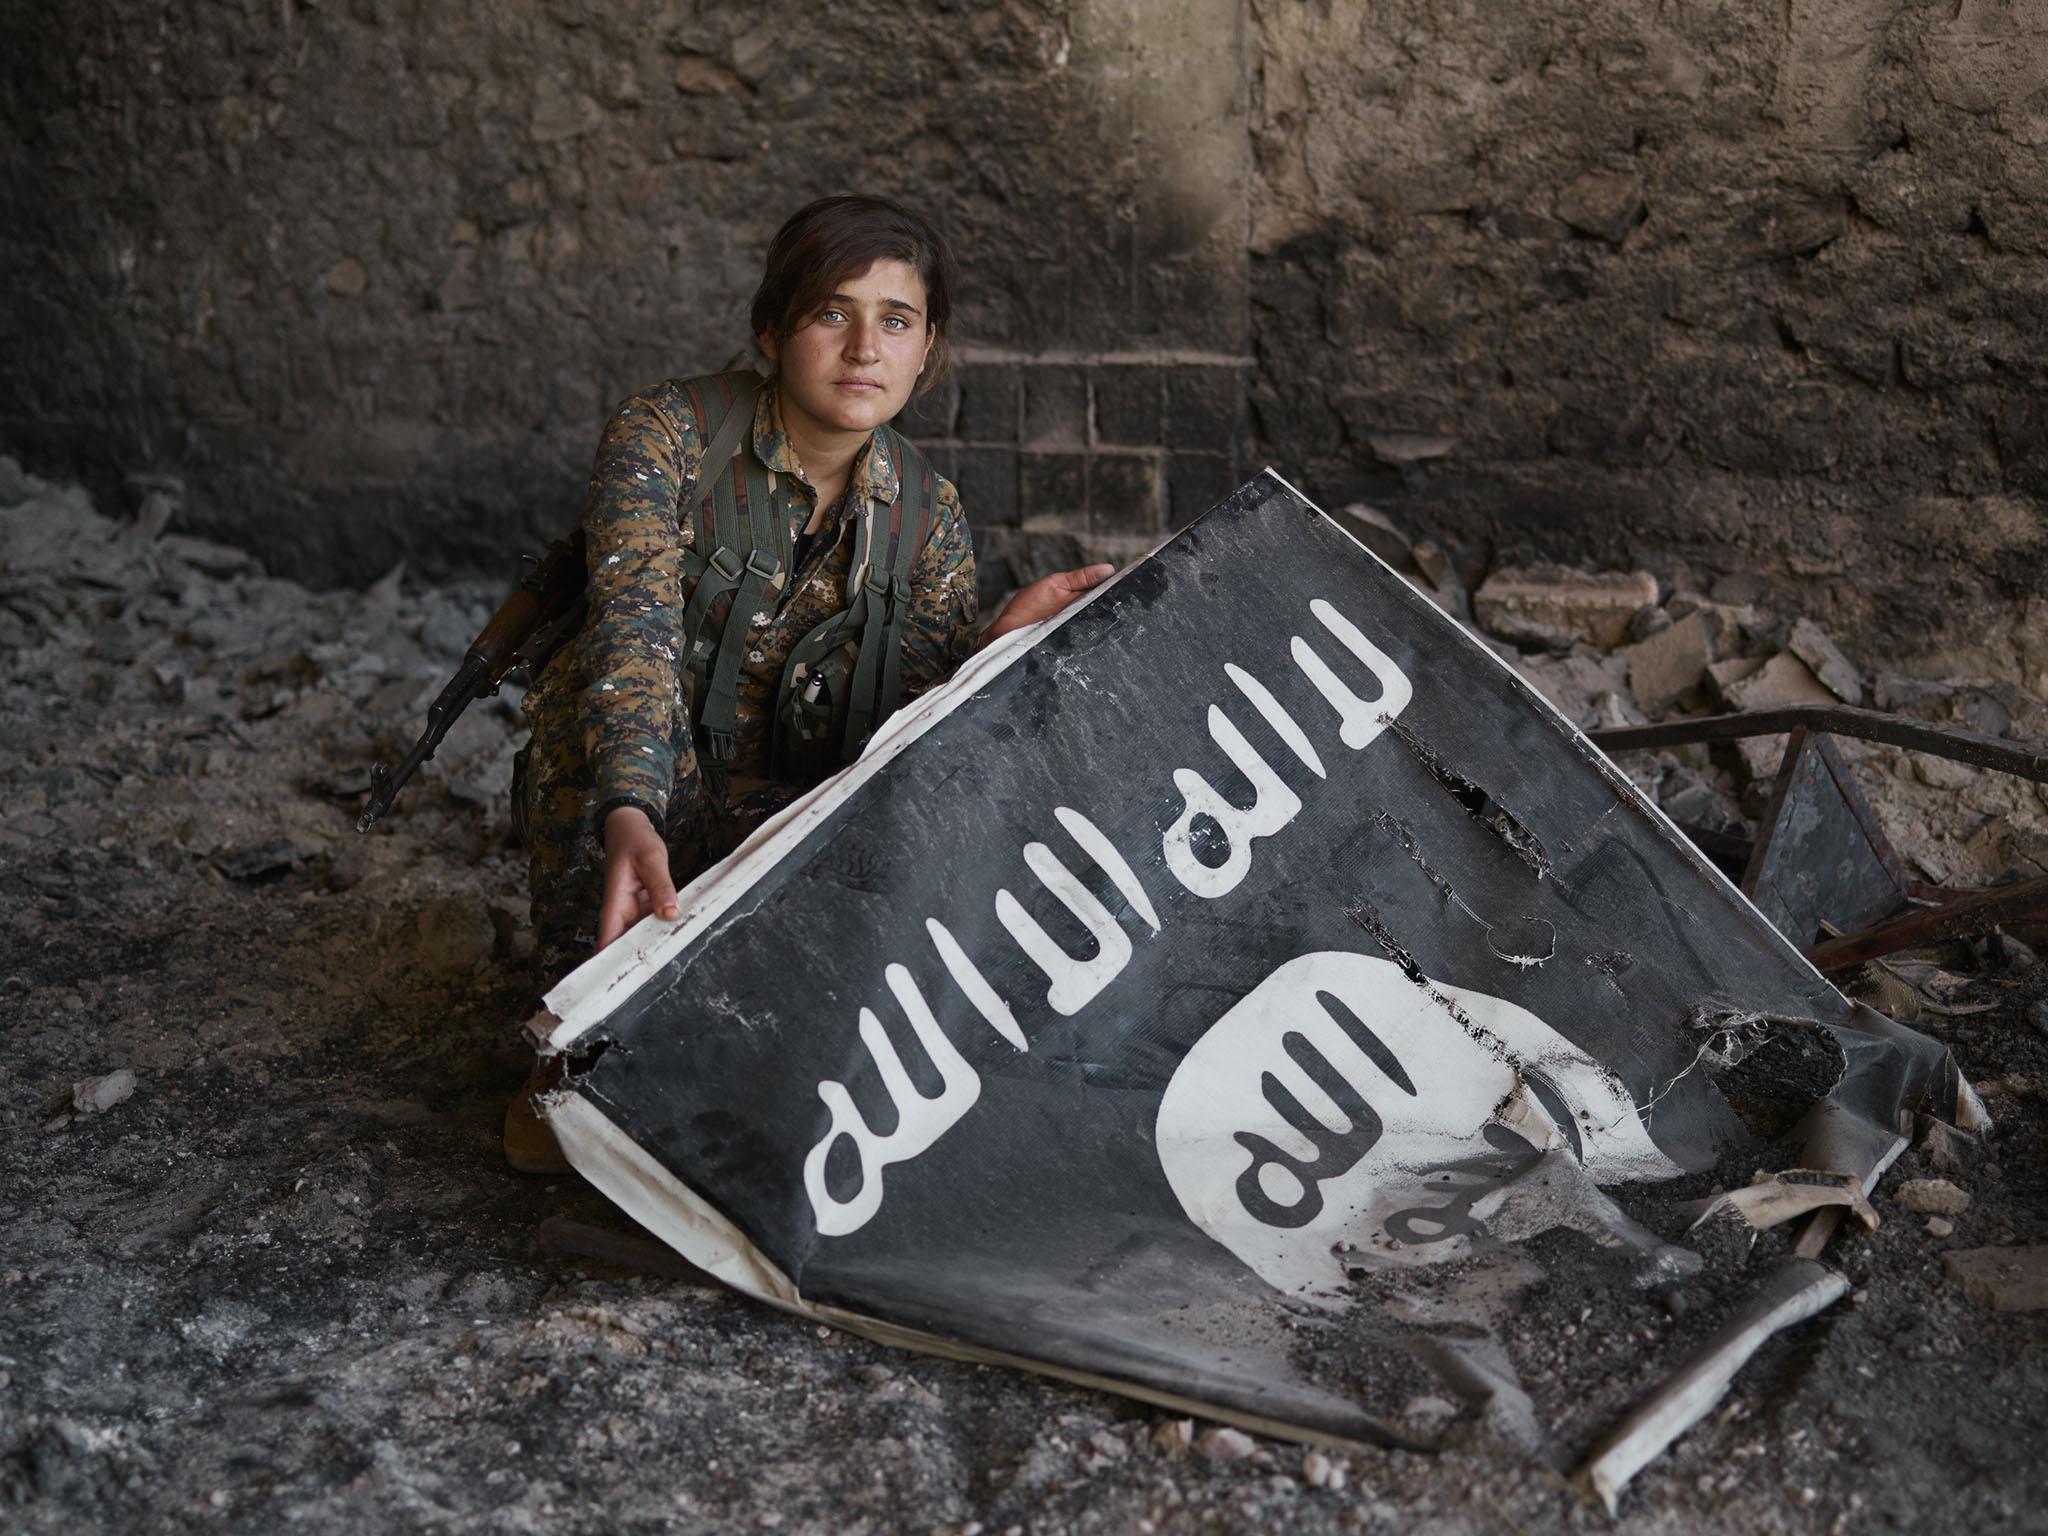 [Image: We-Came-From-Fire-Iraq-Syria-Kurdistan-Joey-L-001.jpg]